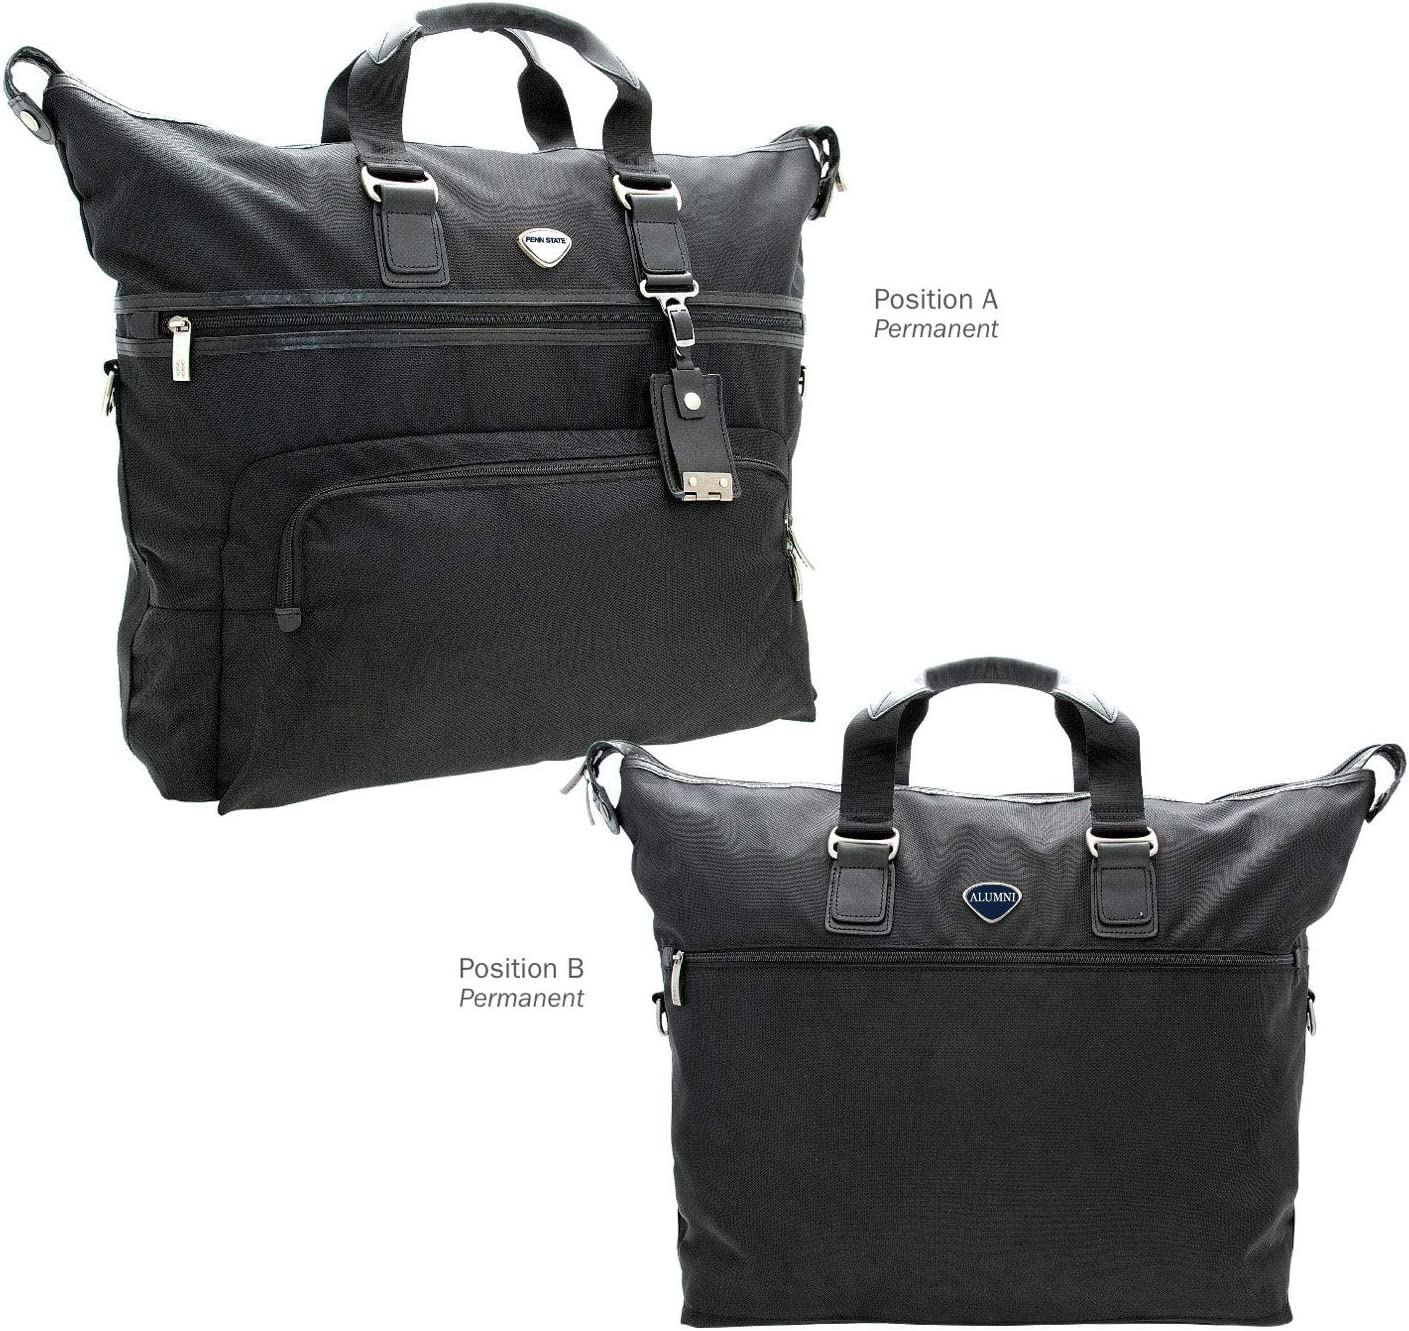 AdSpec NCAA Penn State Nittany Lions Collegiate Executive Weekender Duffel BagCollegiate Executive Weekender Duffel Bag Black One Size